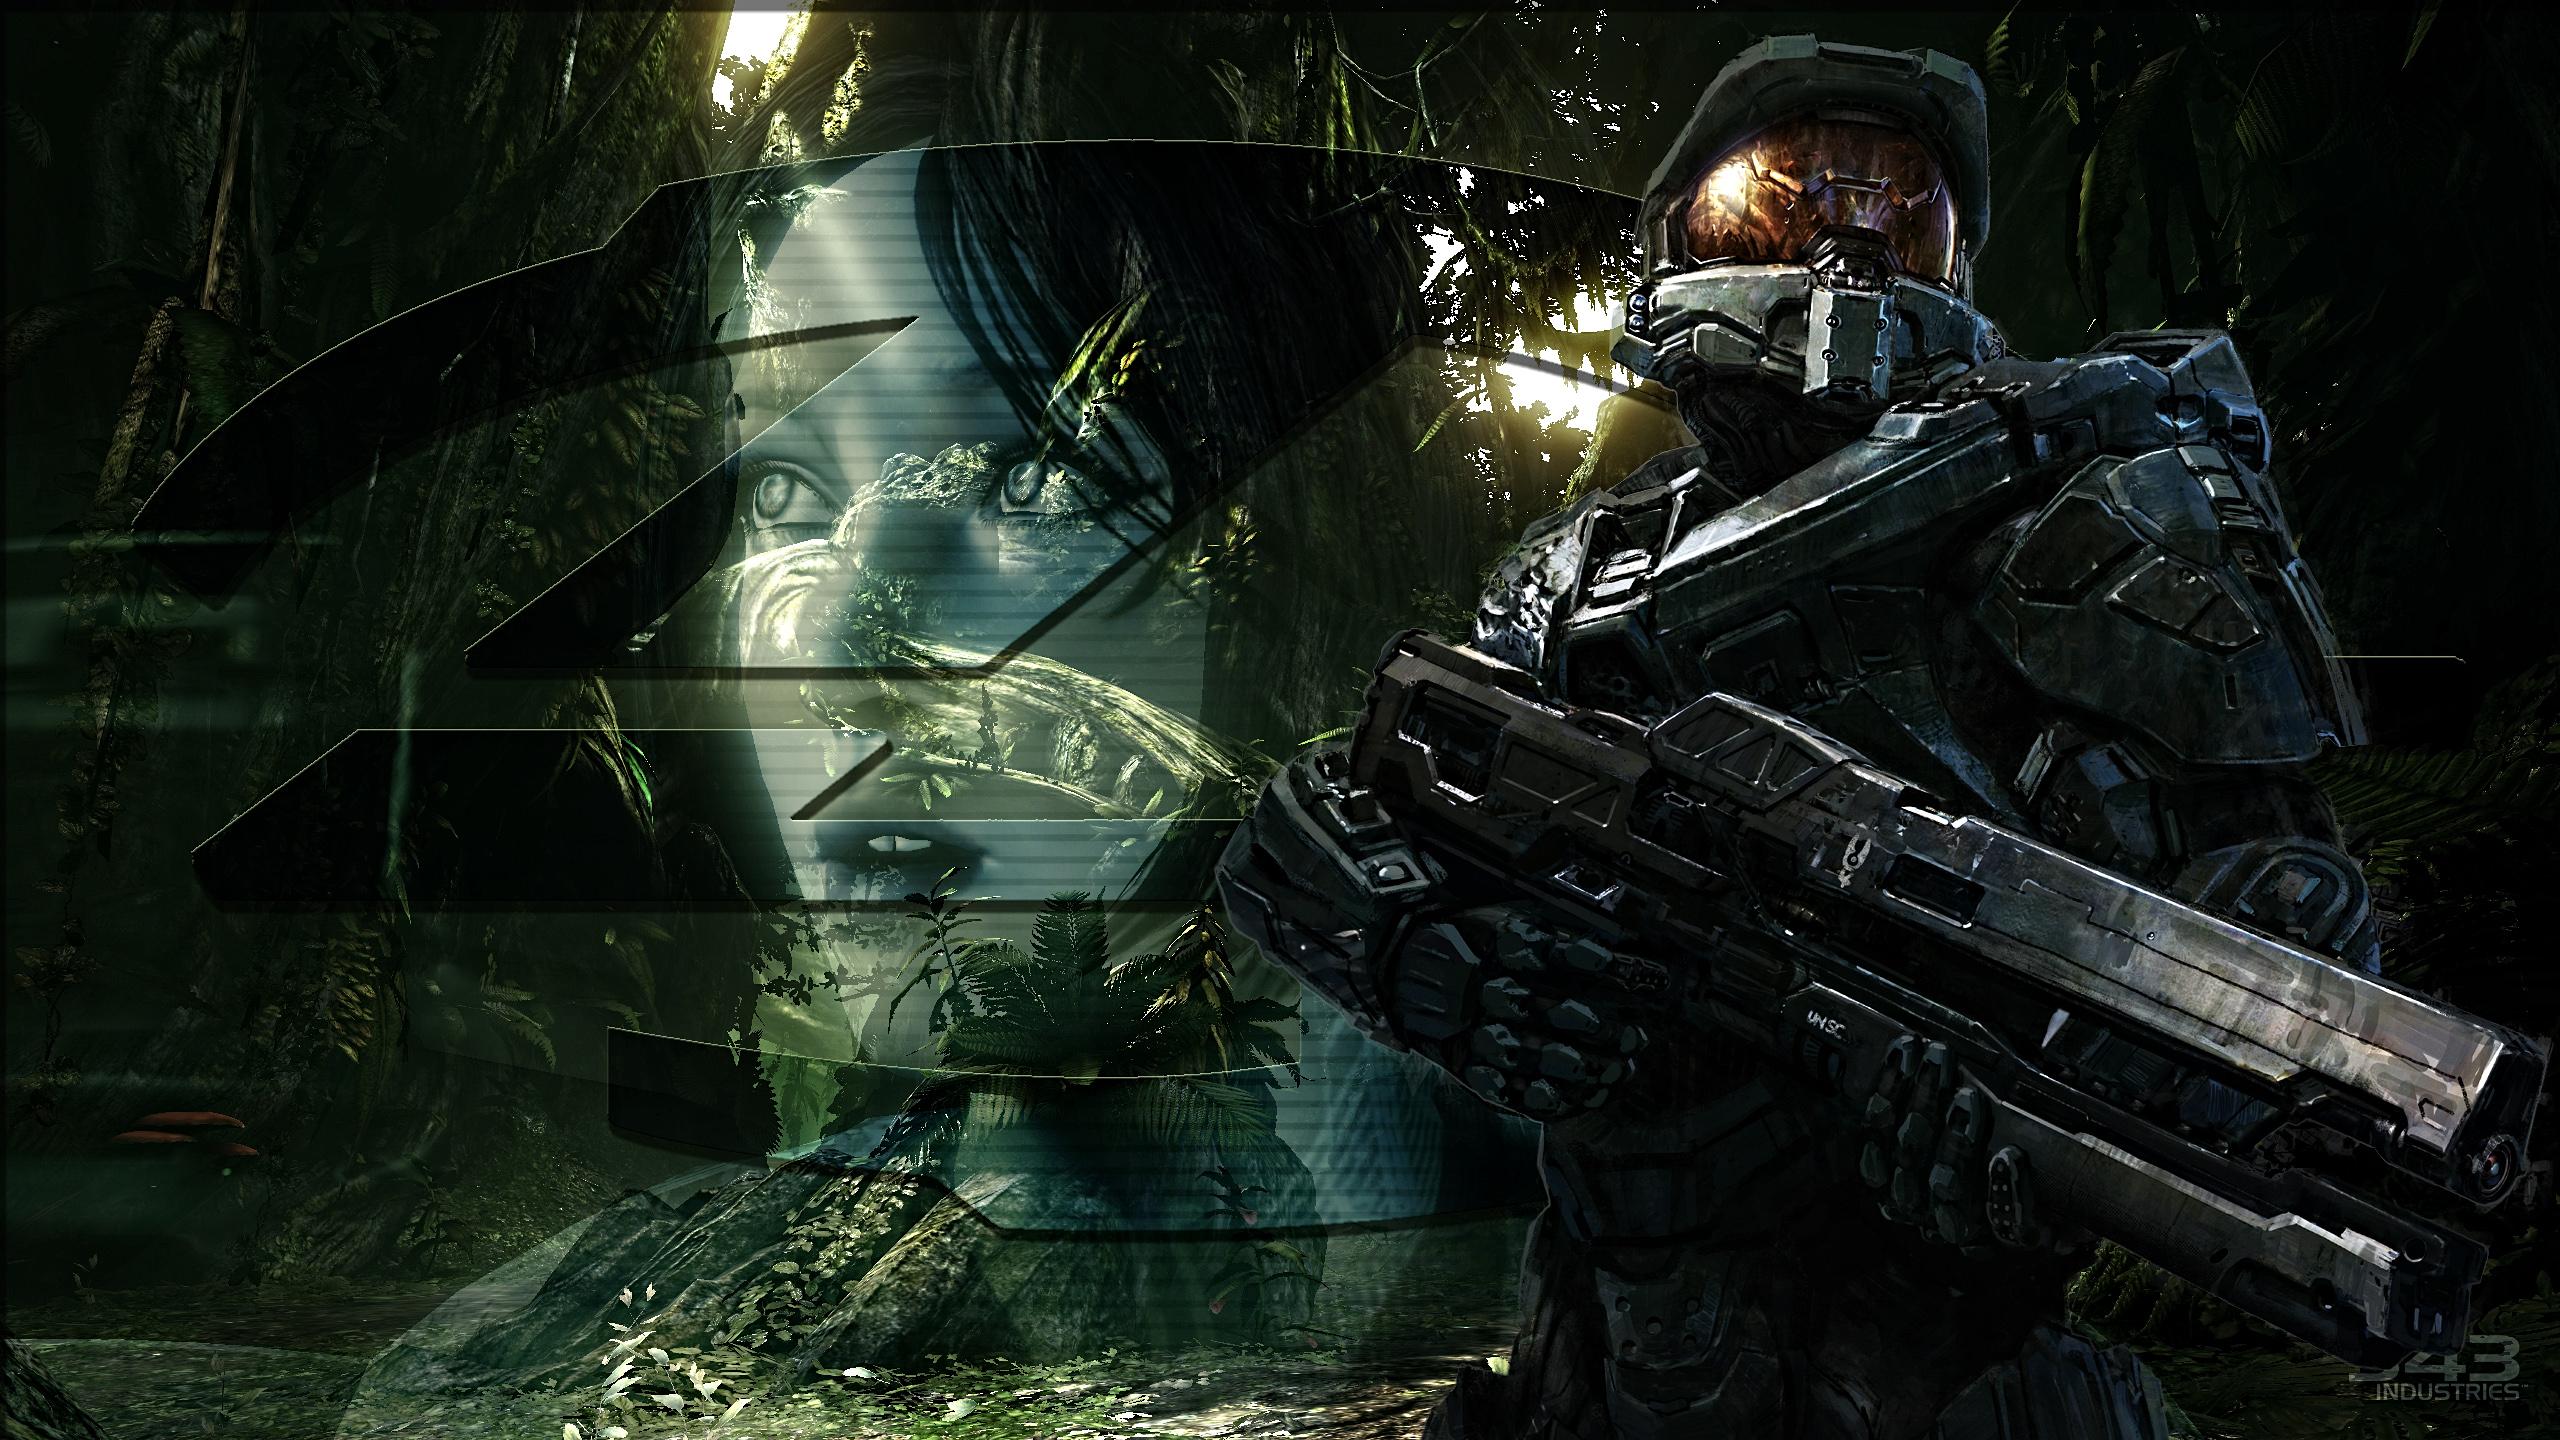 Halo 4 Desktop Wallpaper HD Download 2560x1440